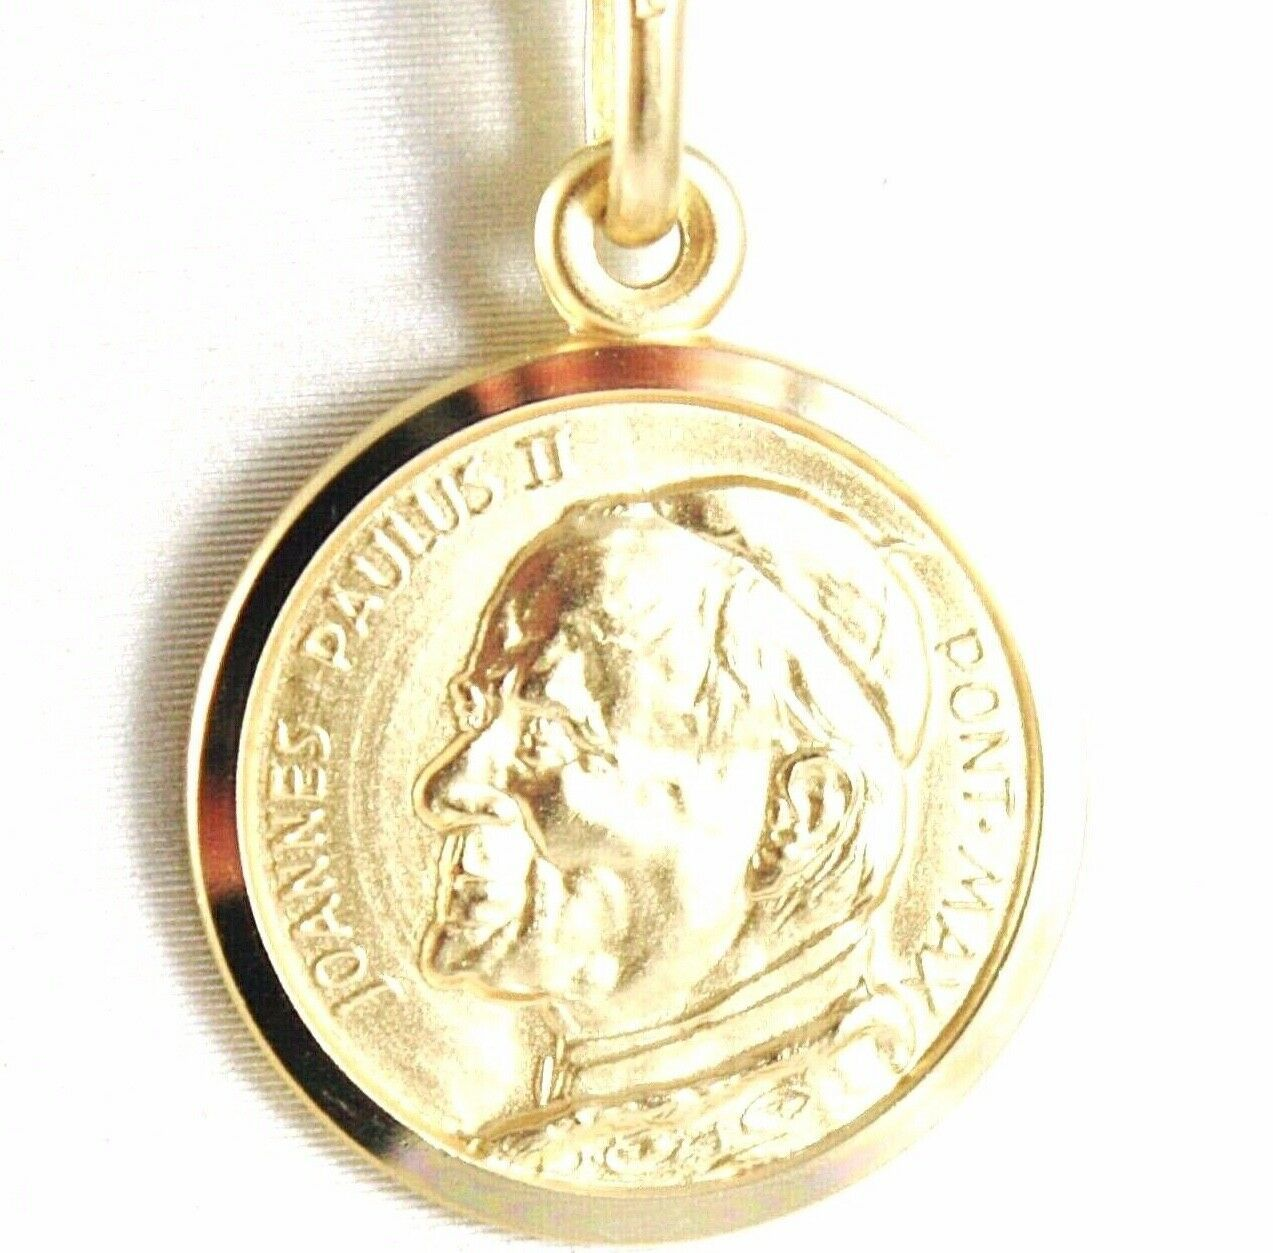 SOLID 18K YELLOW GOLD SAINT POPE JOHN PAUL II, DIAMET. 17 MM MEDAL MADE IN ITALY